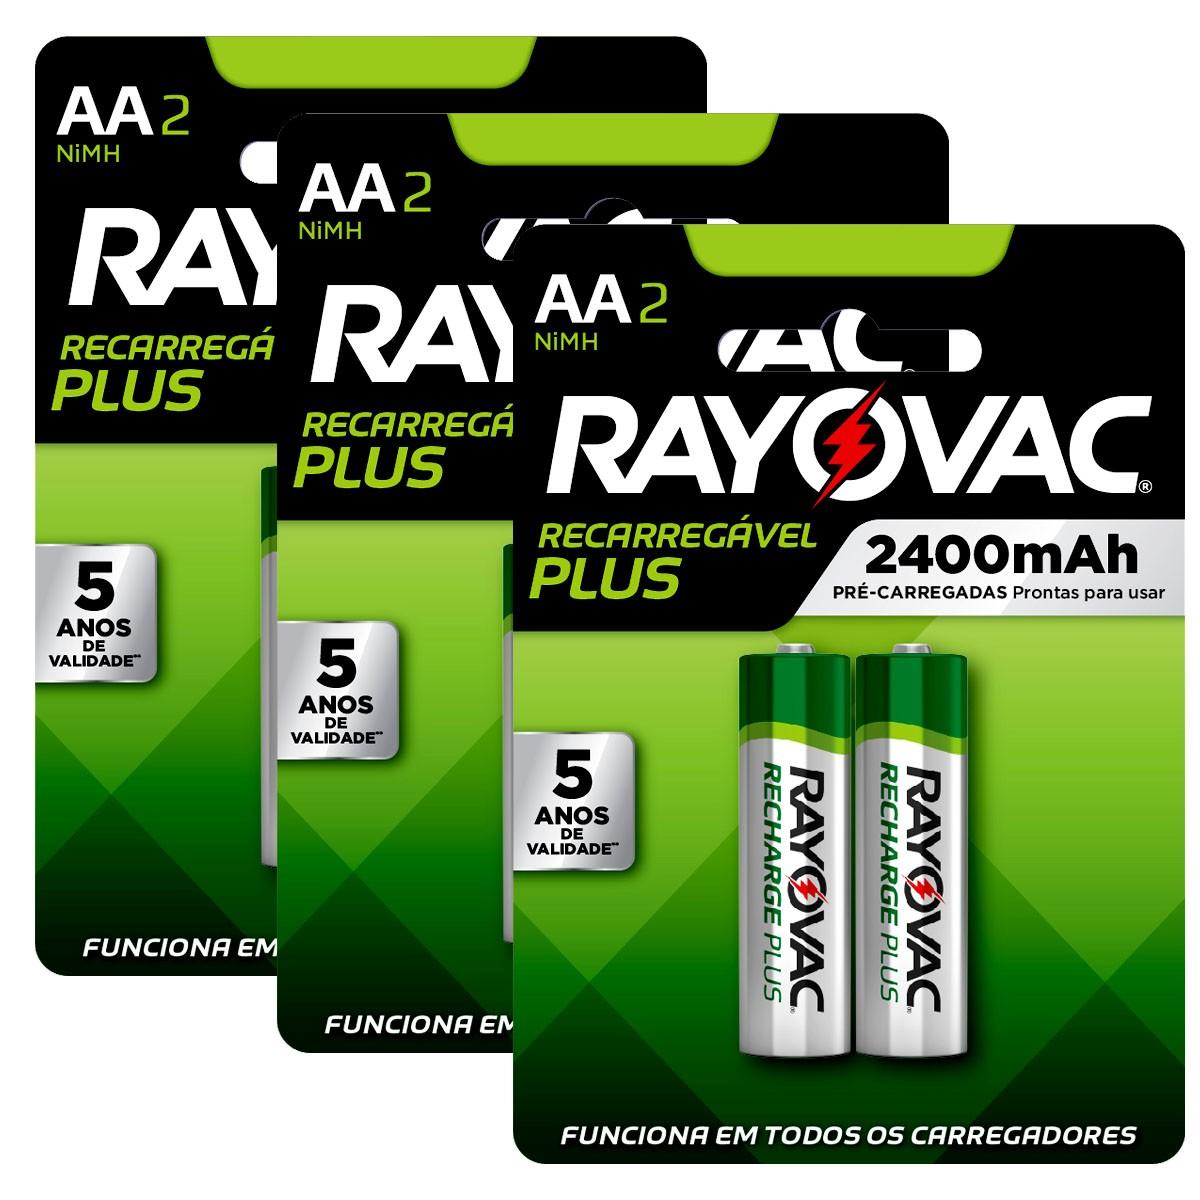 06 Pilhas AA Recarregável 2400mAh RAYOVAC 3 cartelas